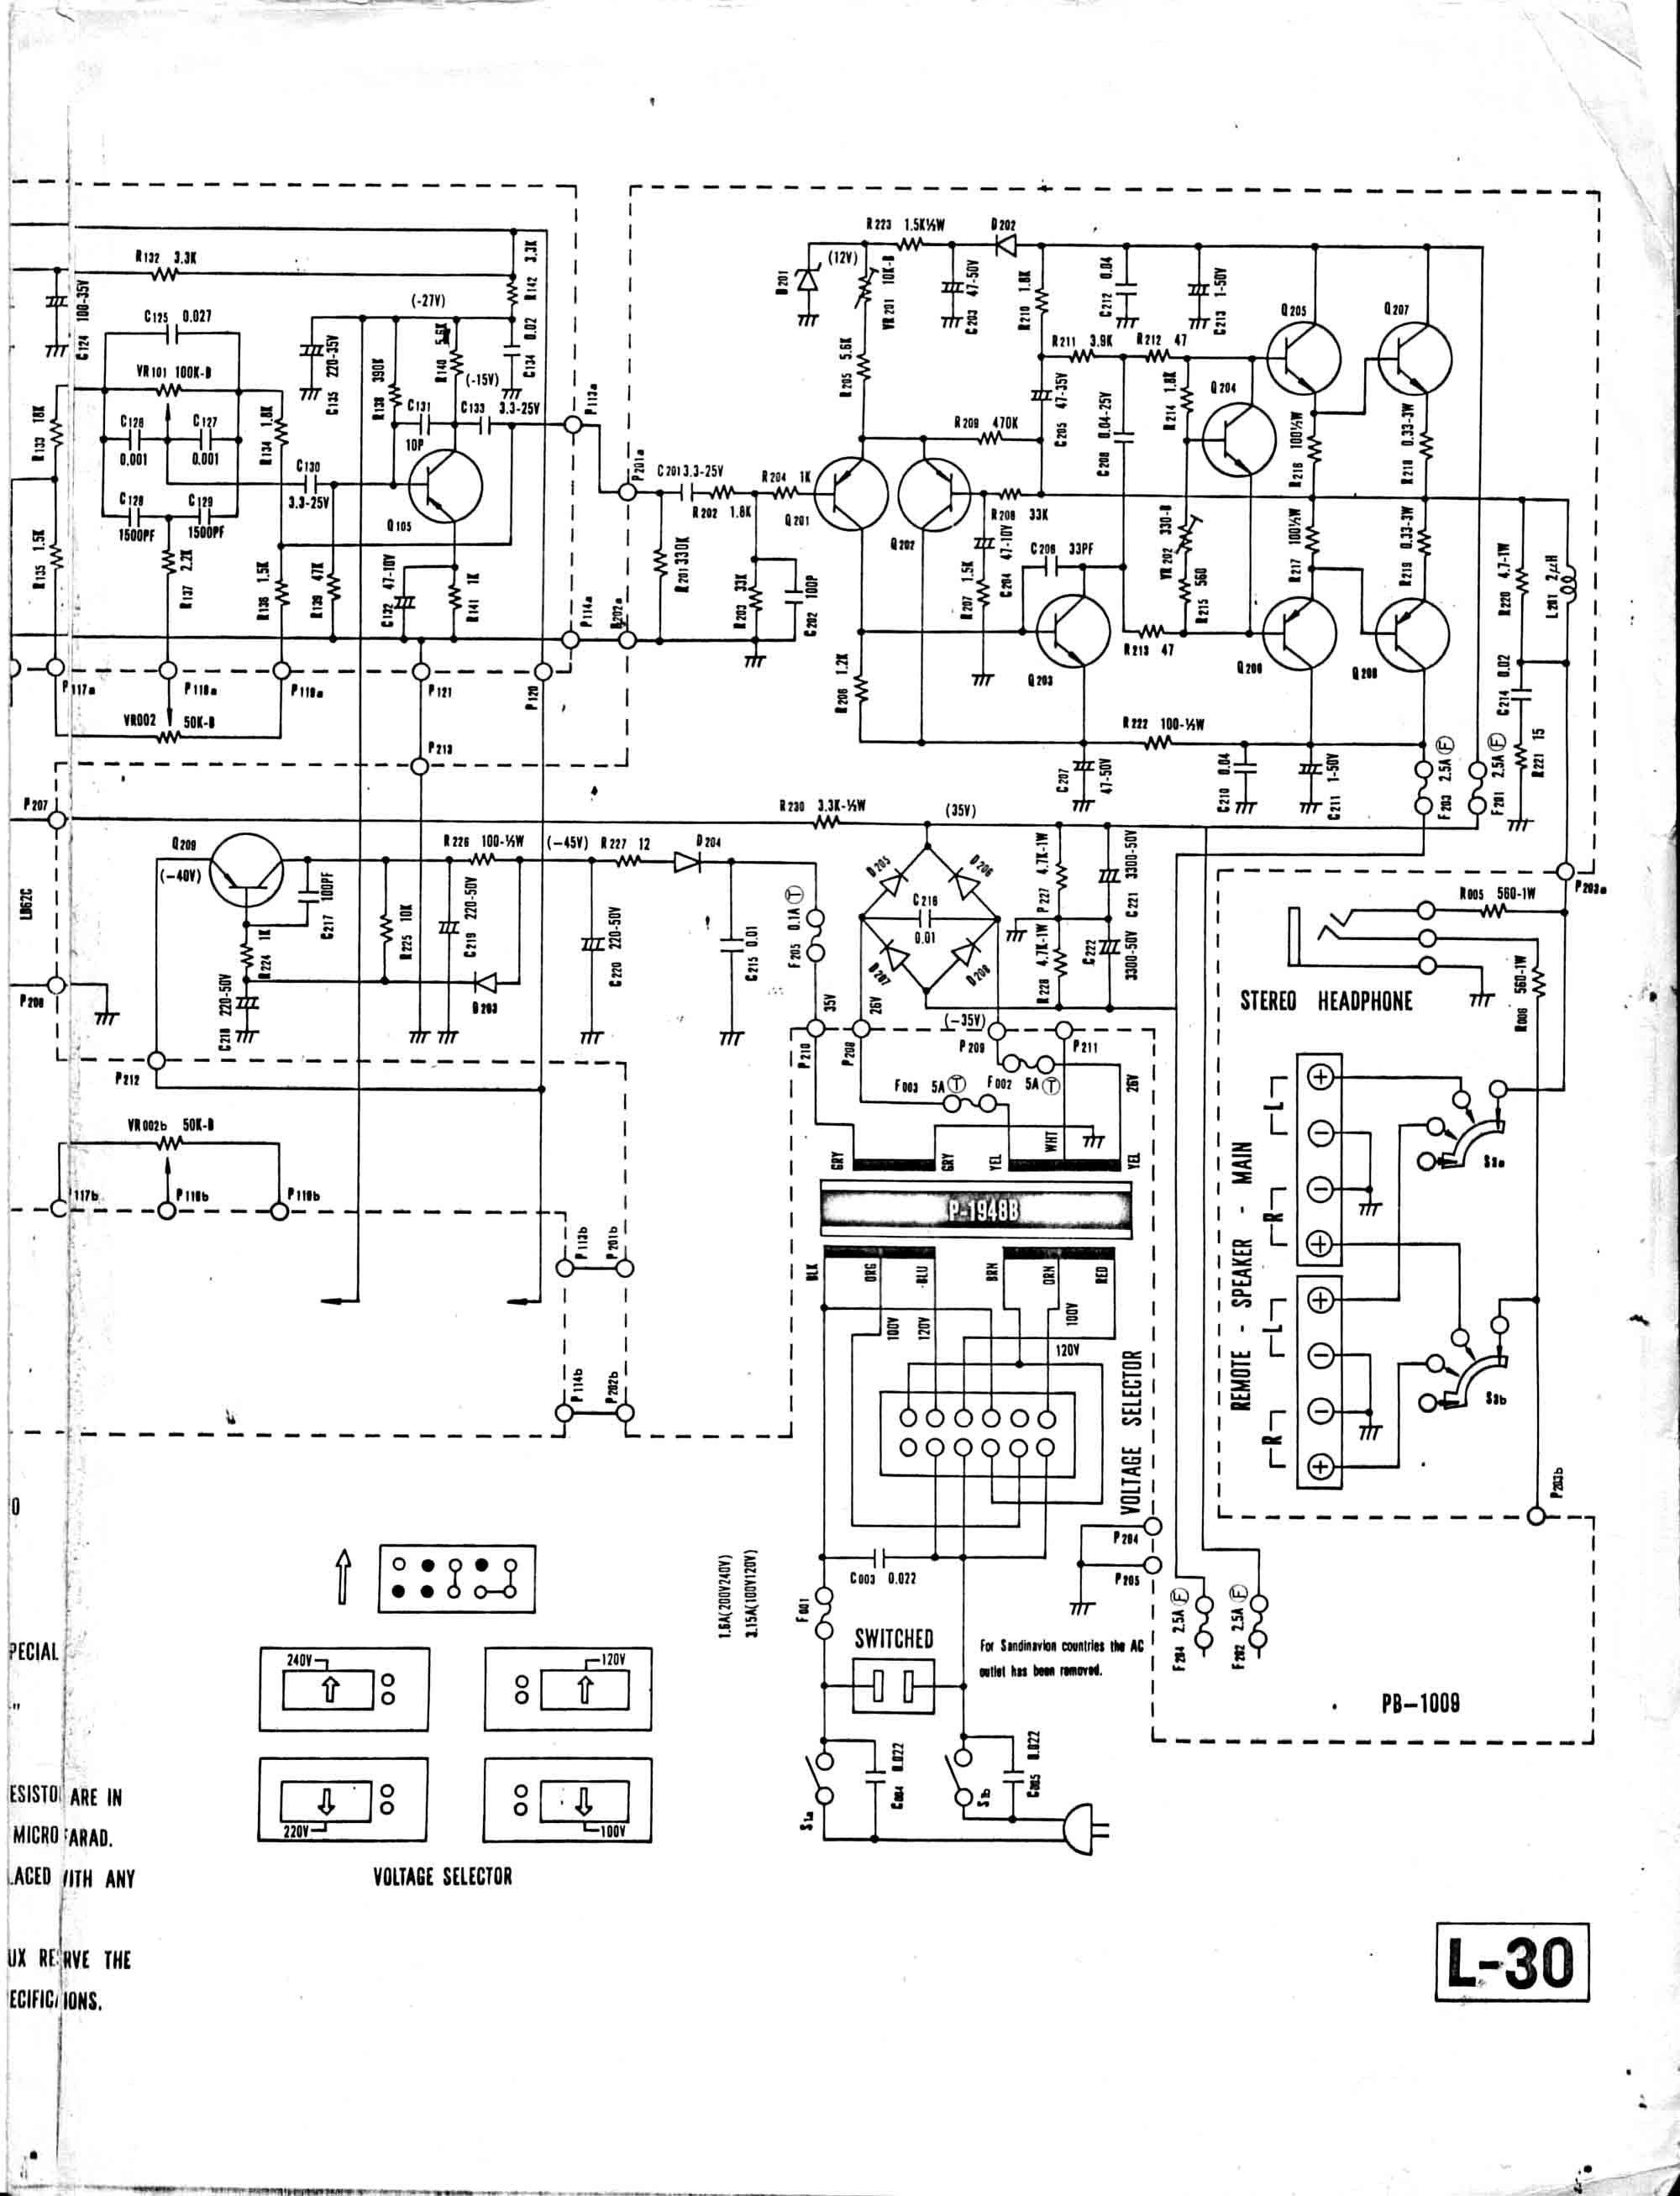 Array luxman wiring diagram free download wiring diagrams schematics rh kizi3 co